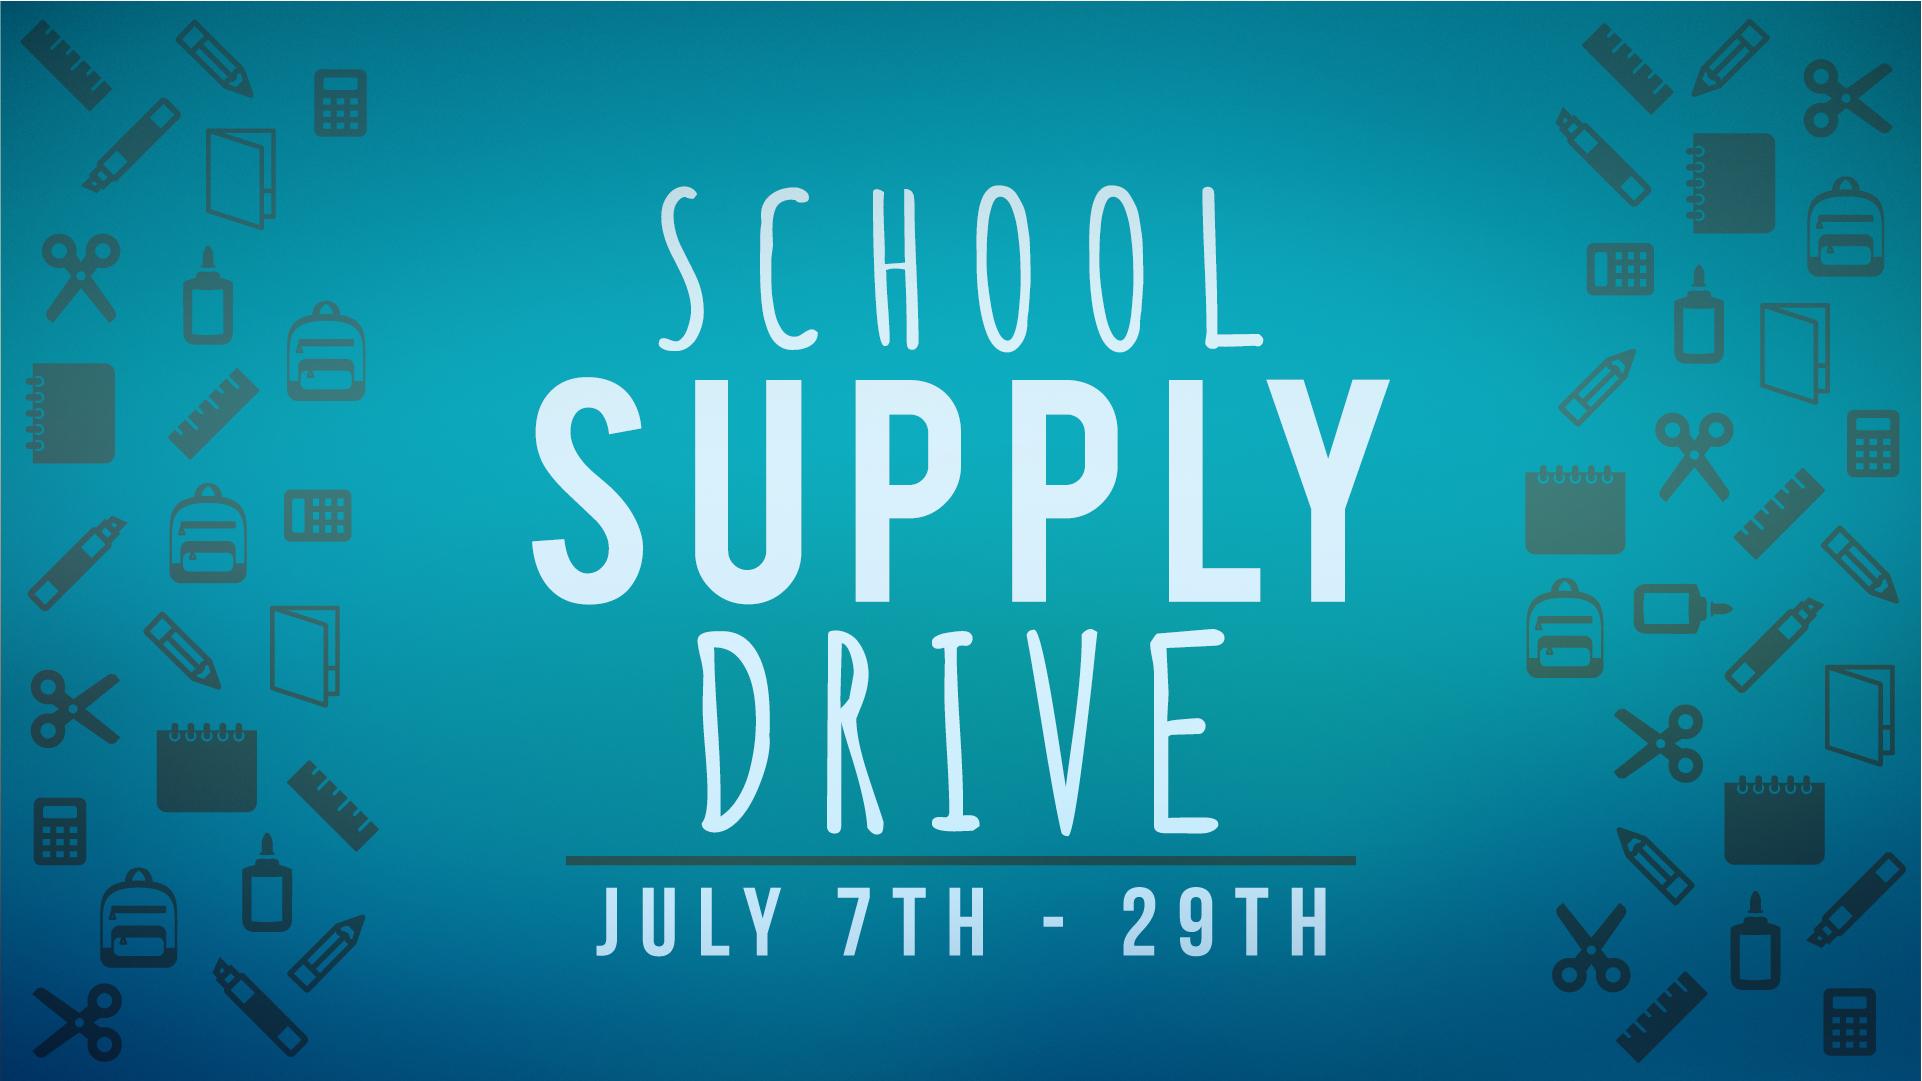 School Supply Drive Vector.jpg